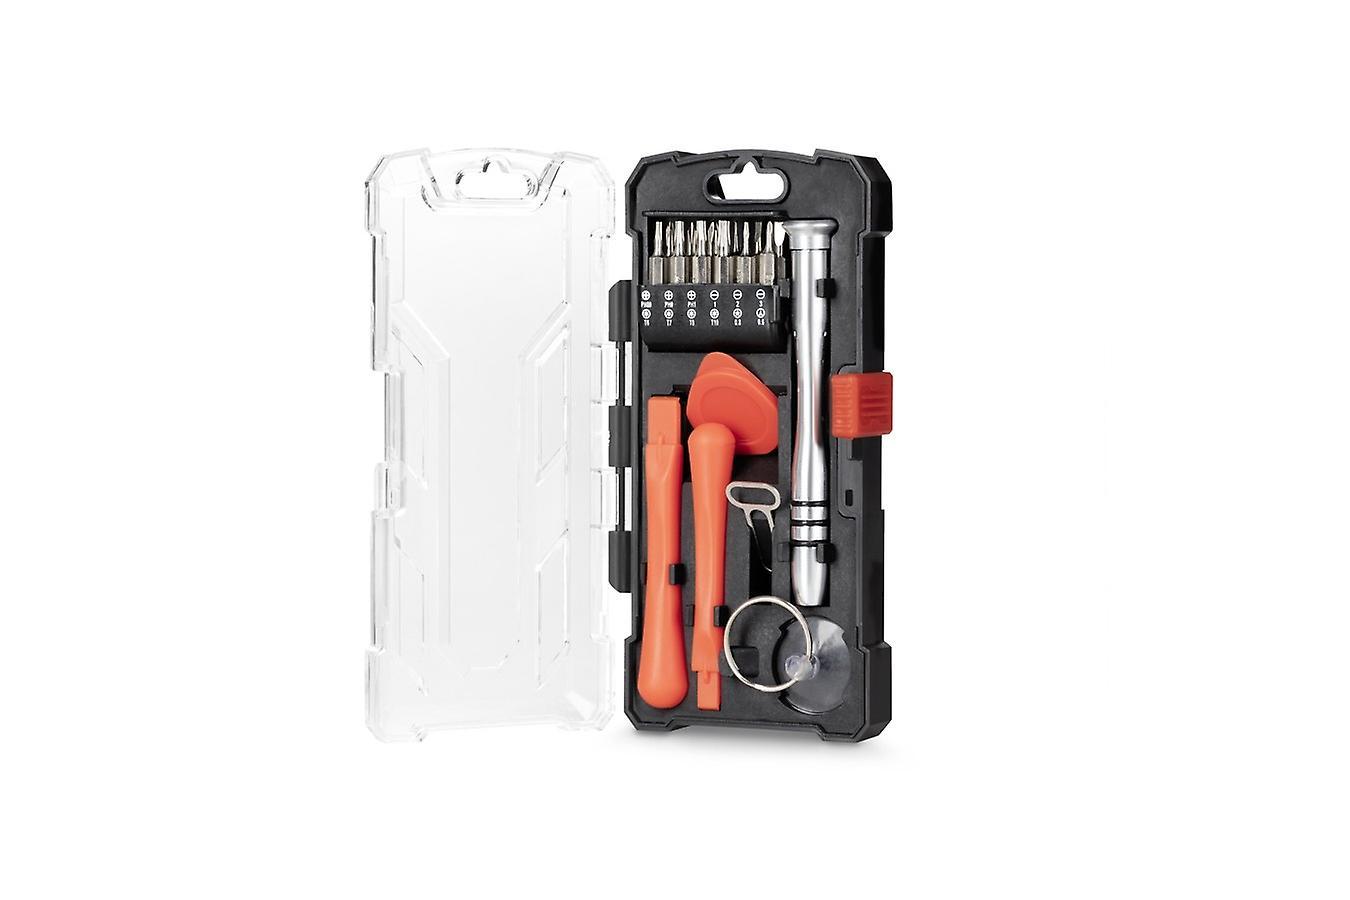 WOLFGANG 3 in 1 Hobby Tool Set, Precision Screwdriver Set, Scalpel Blades Set, Model Making, DIY, Smartphone Repair, Laptop, PC, Watches, Glasses etc.